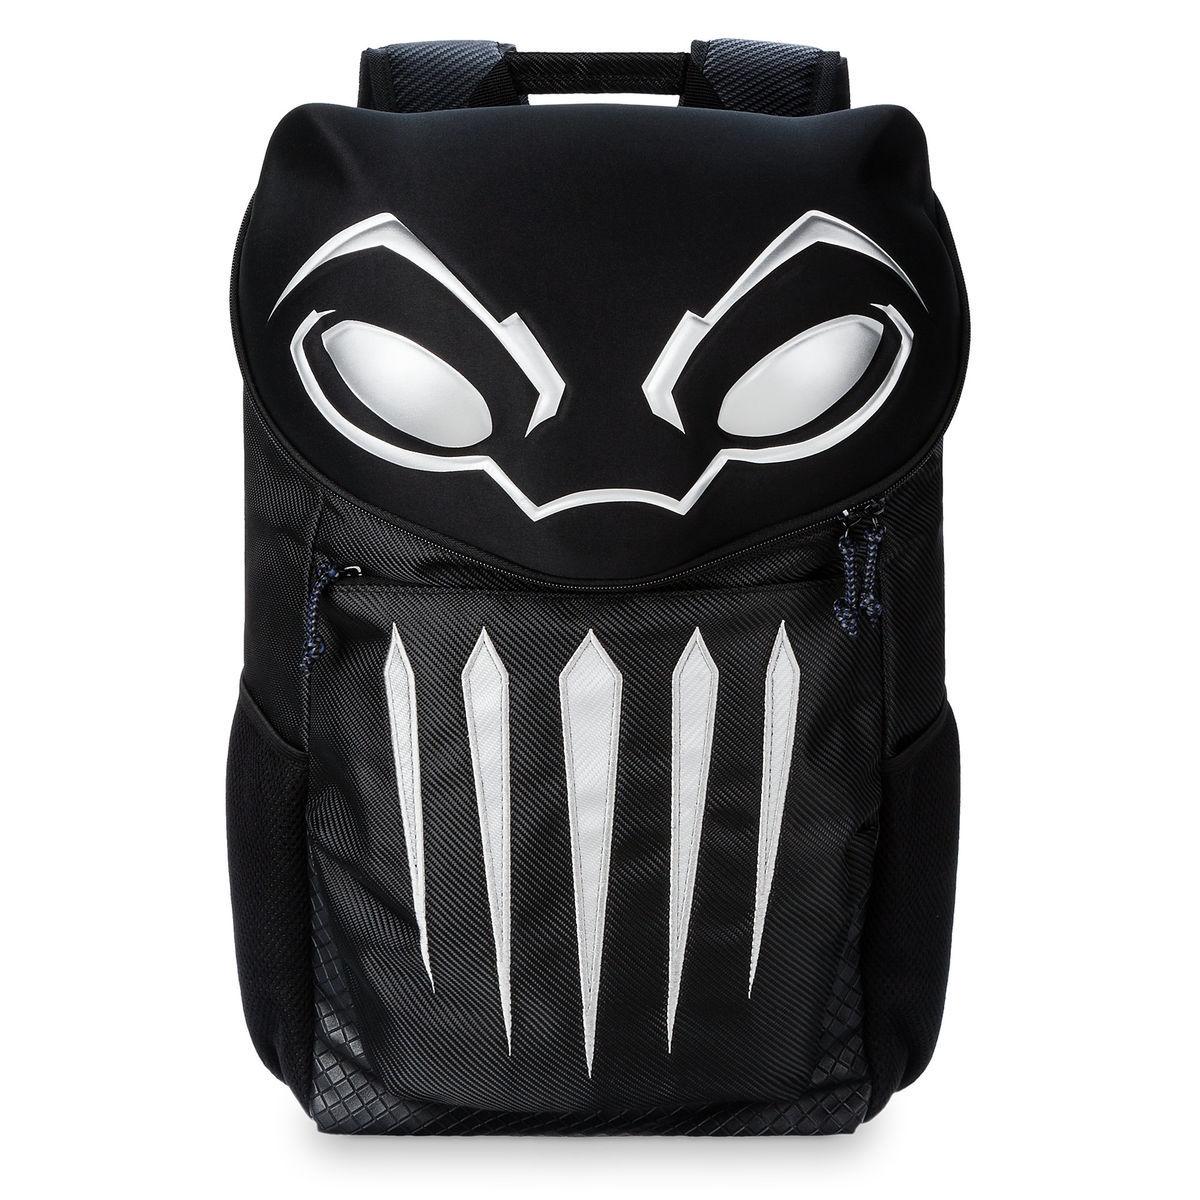 a75f1dd7b42e Tiny Black Backpack- Fenix Toulouse Handball